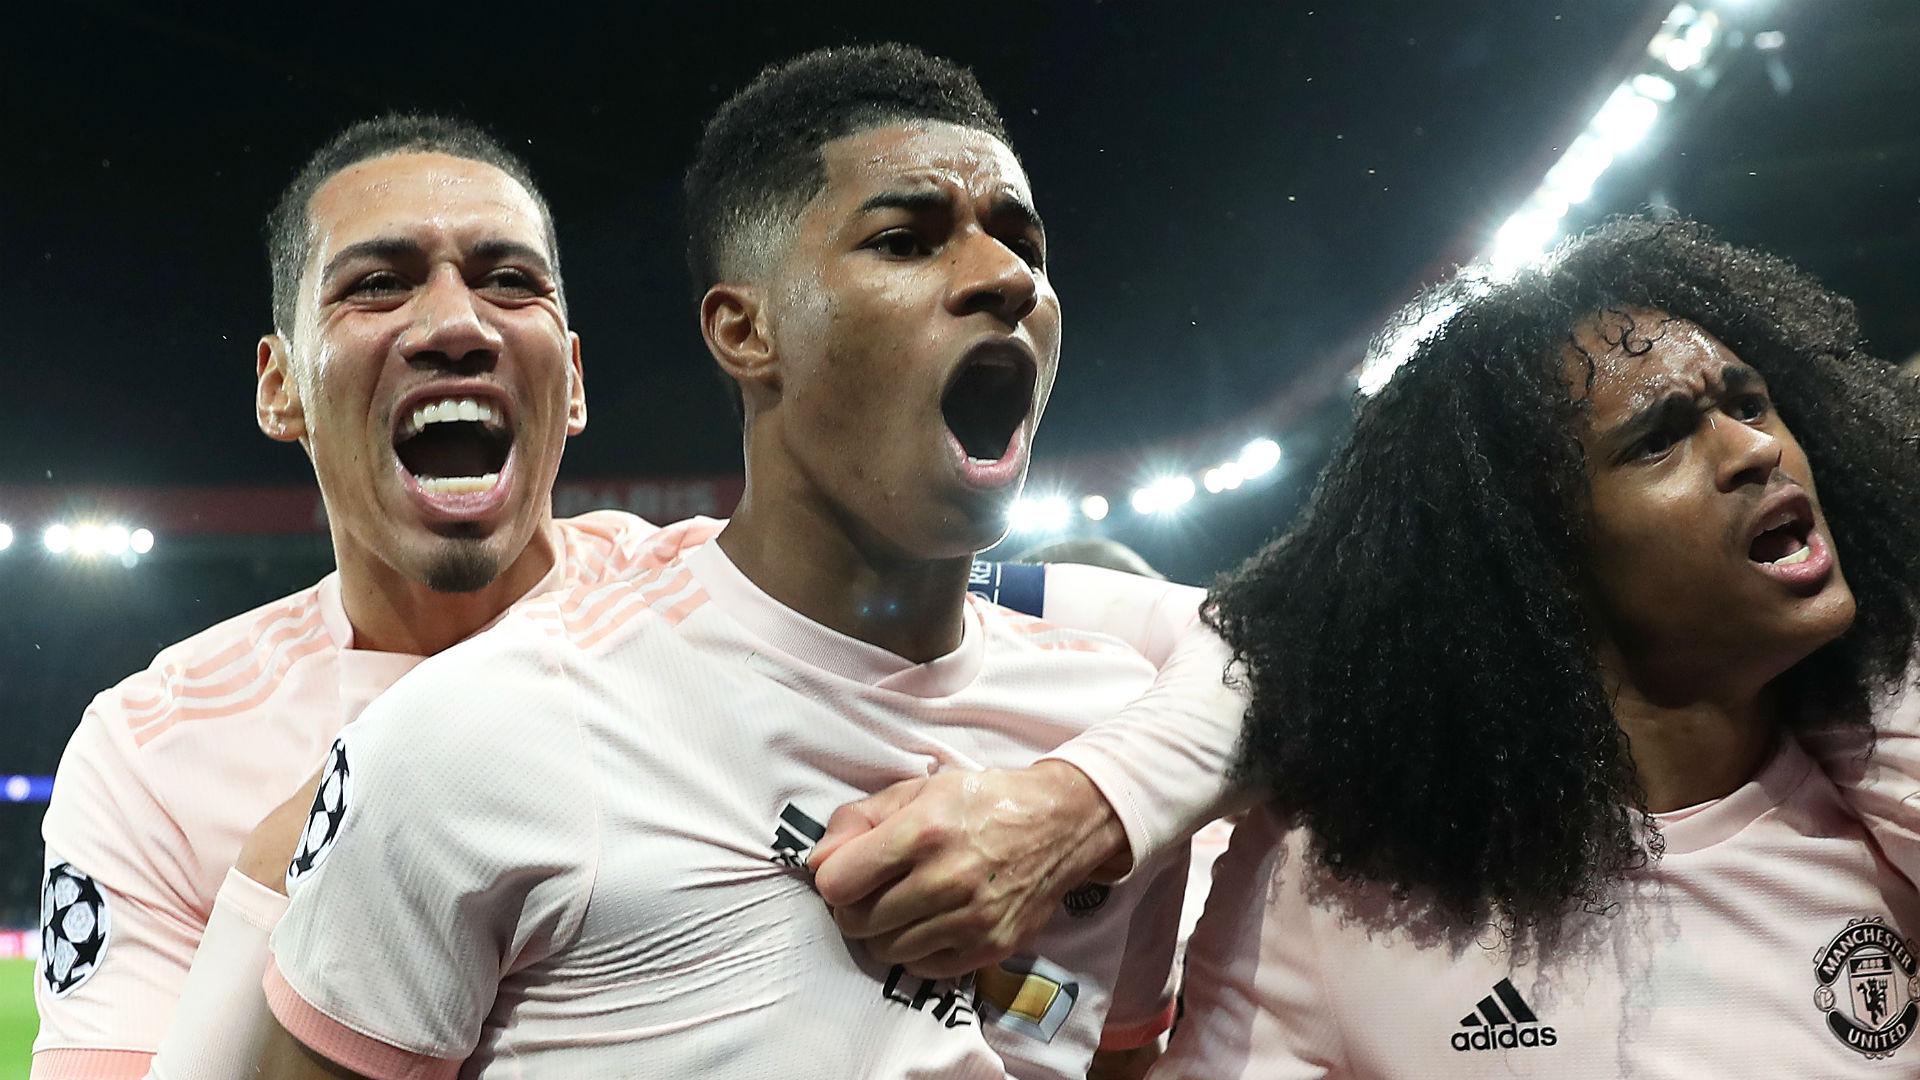 Man Utd will ensure Chong & Greenwood do not 'burn out' - Smalling